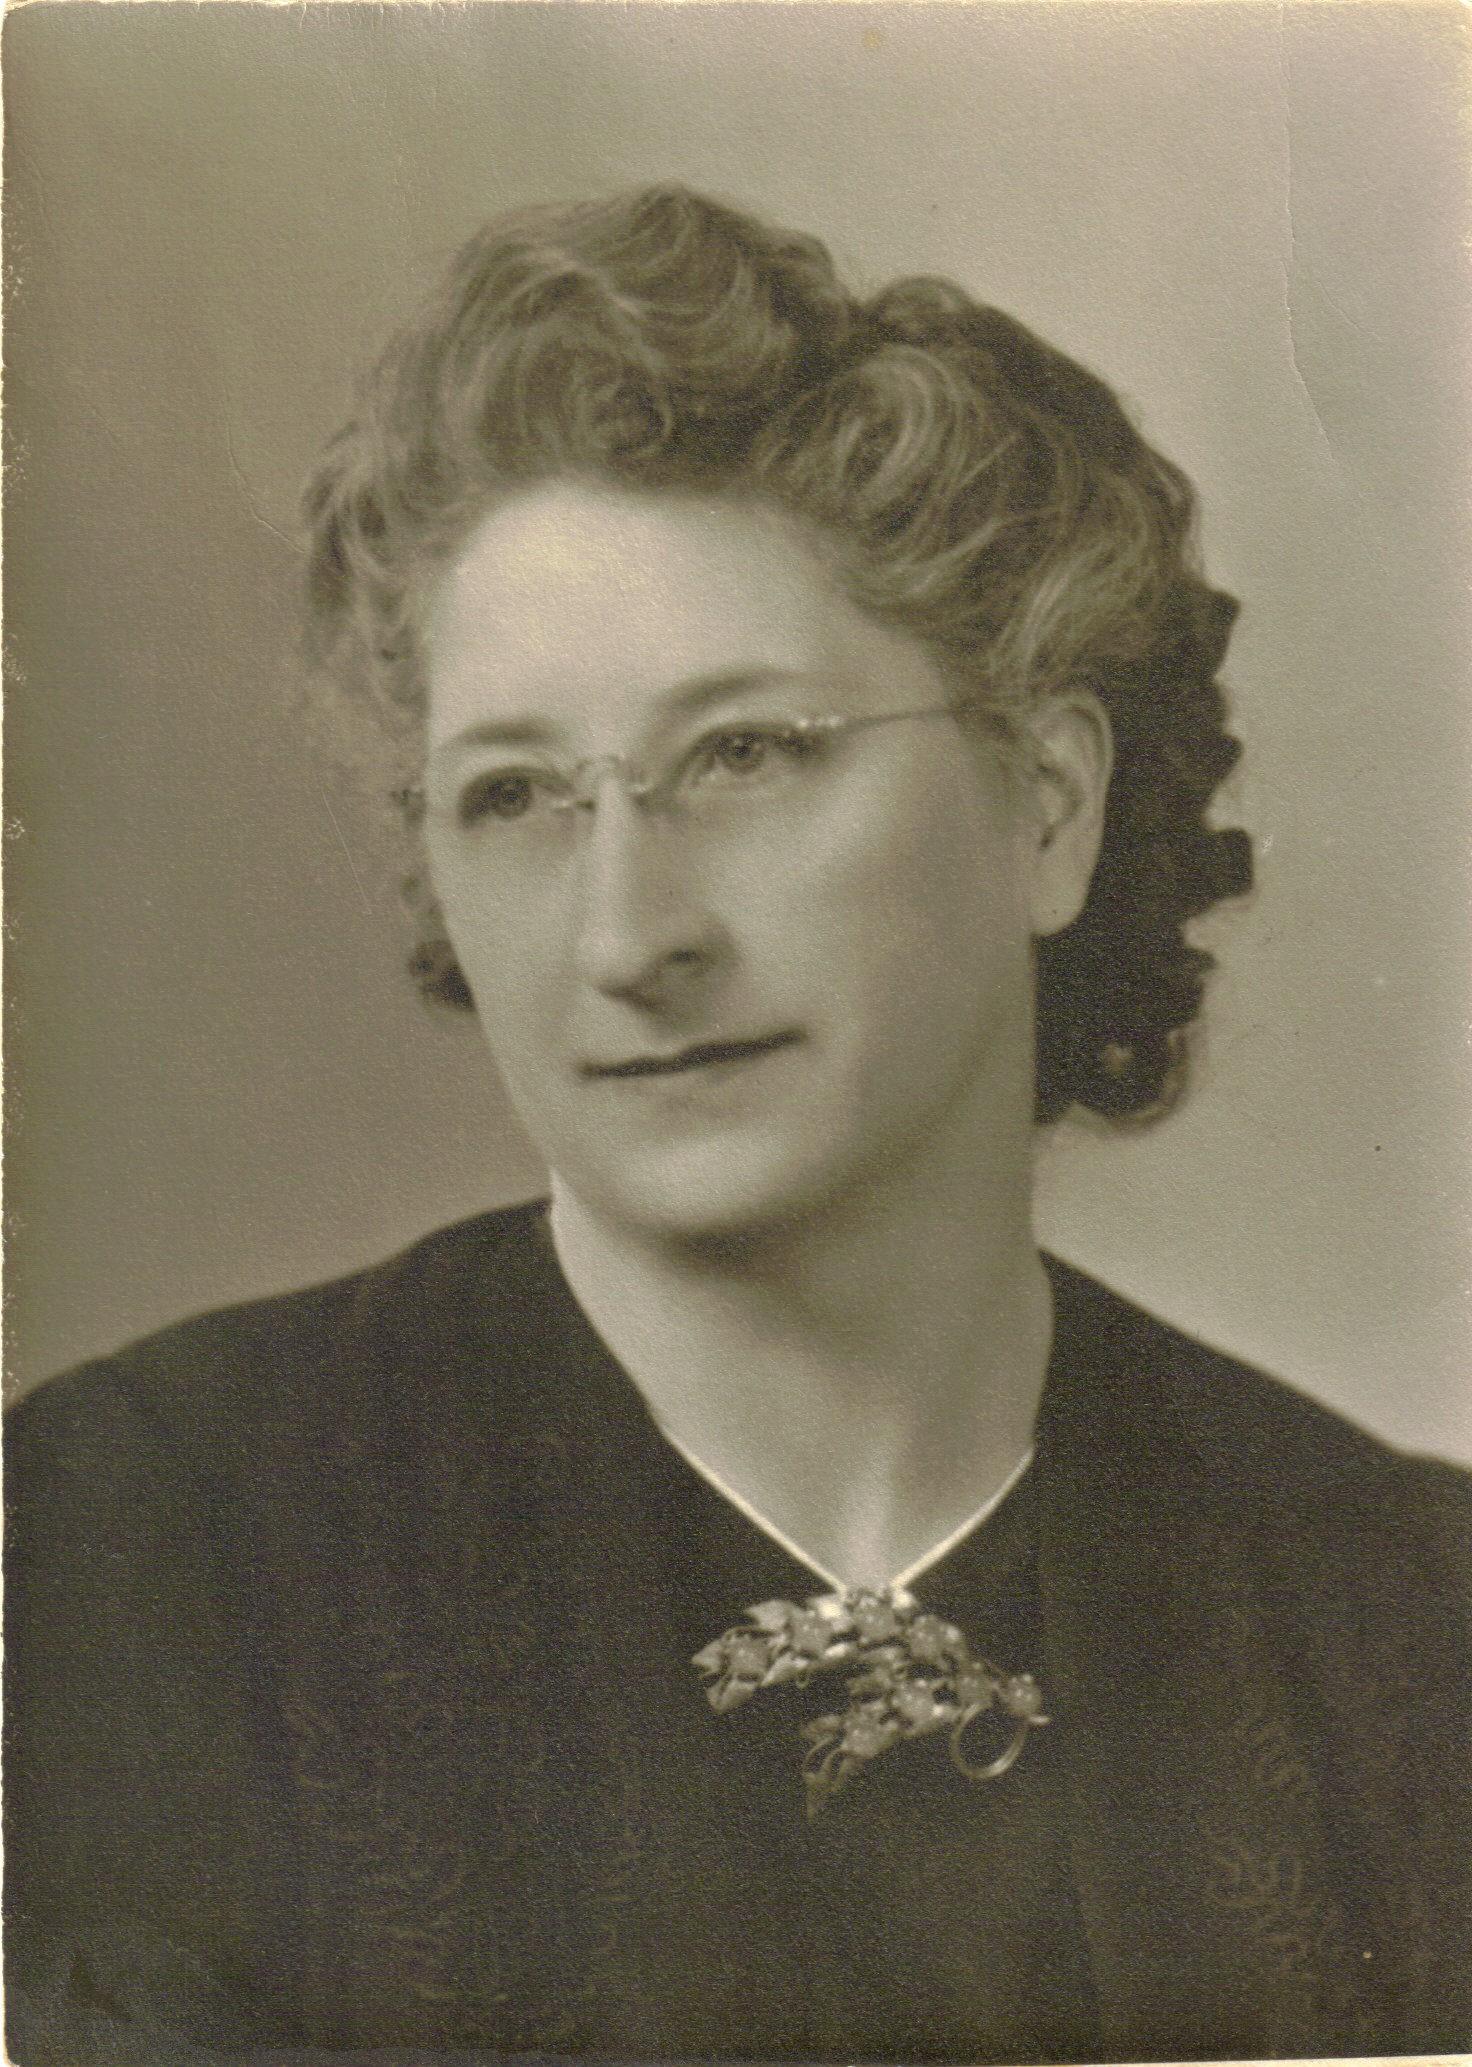 Susie Jane Ledbetter